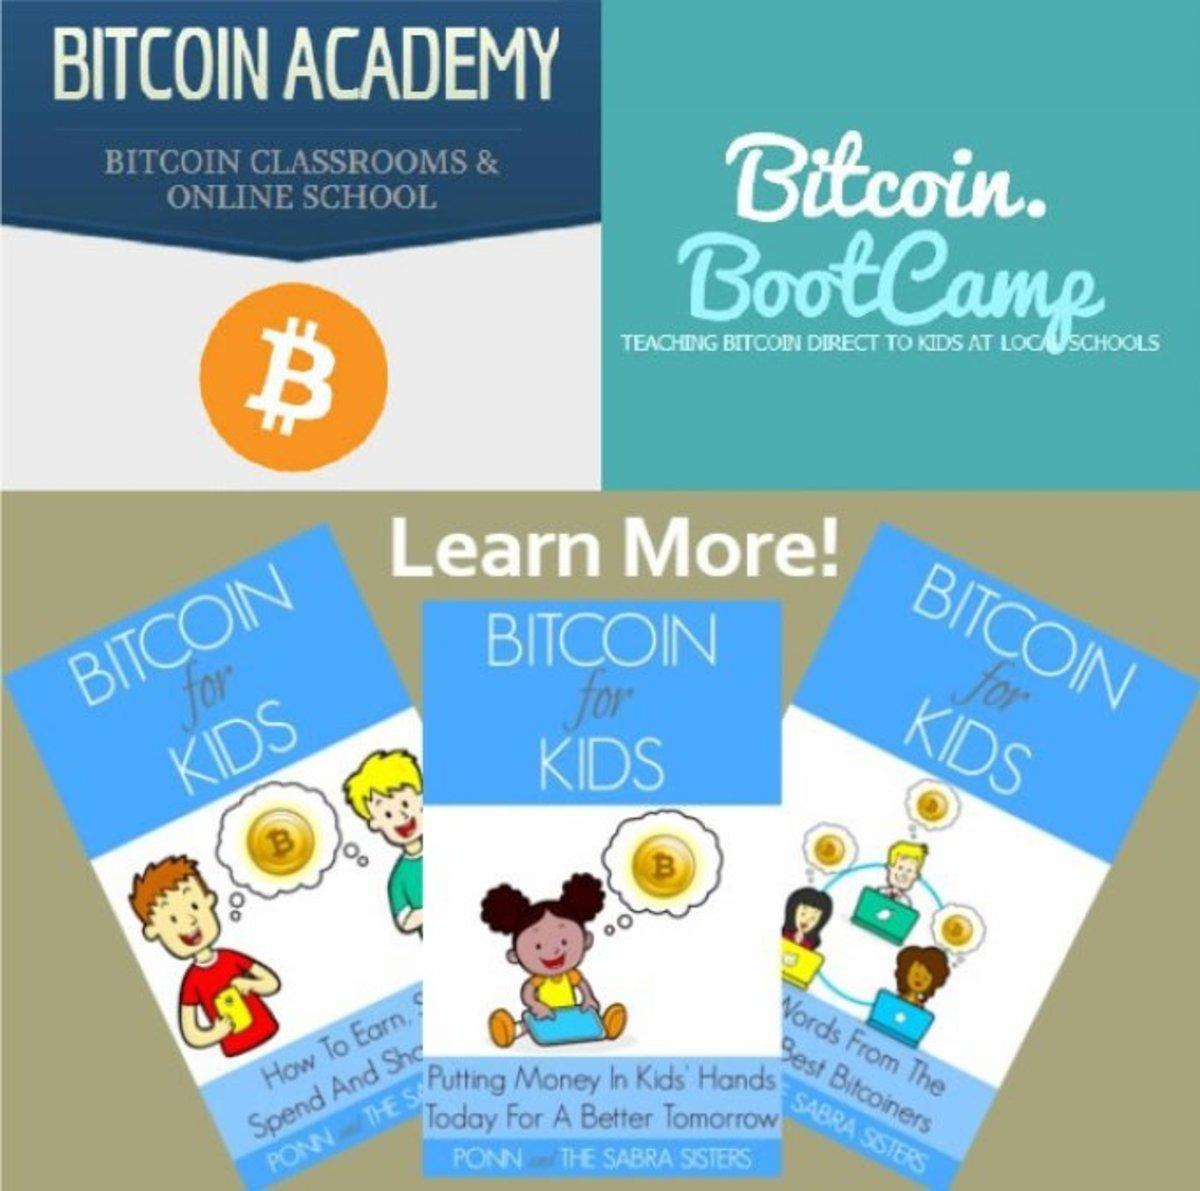 Op-ed - Teaching Bitcoin in Schools – The Bitcoin Academy